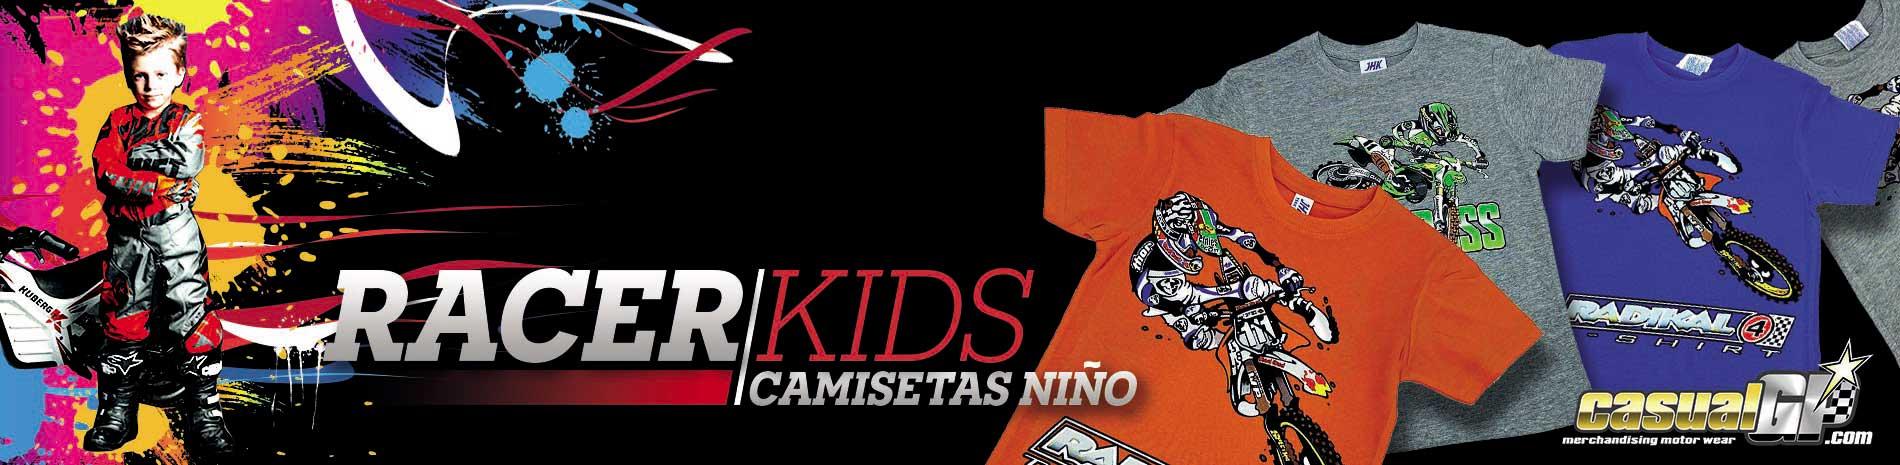 Camisetas niño CasualGp